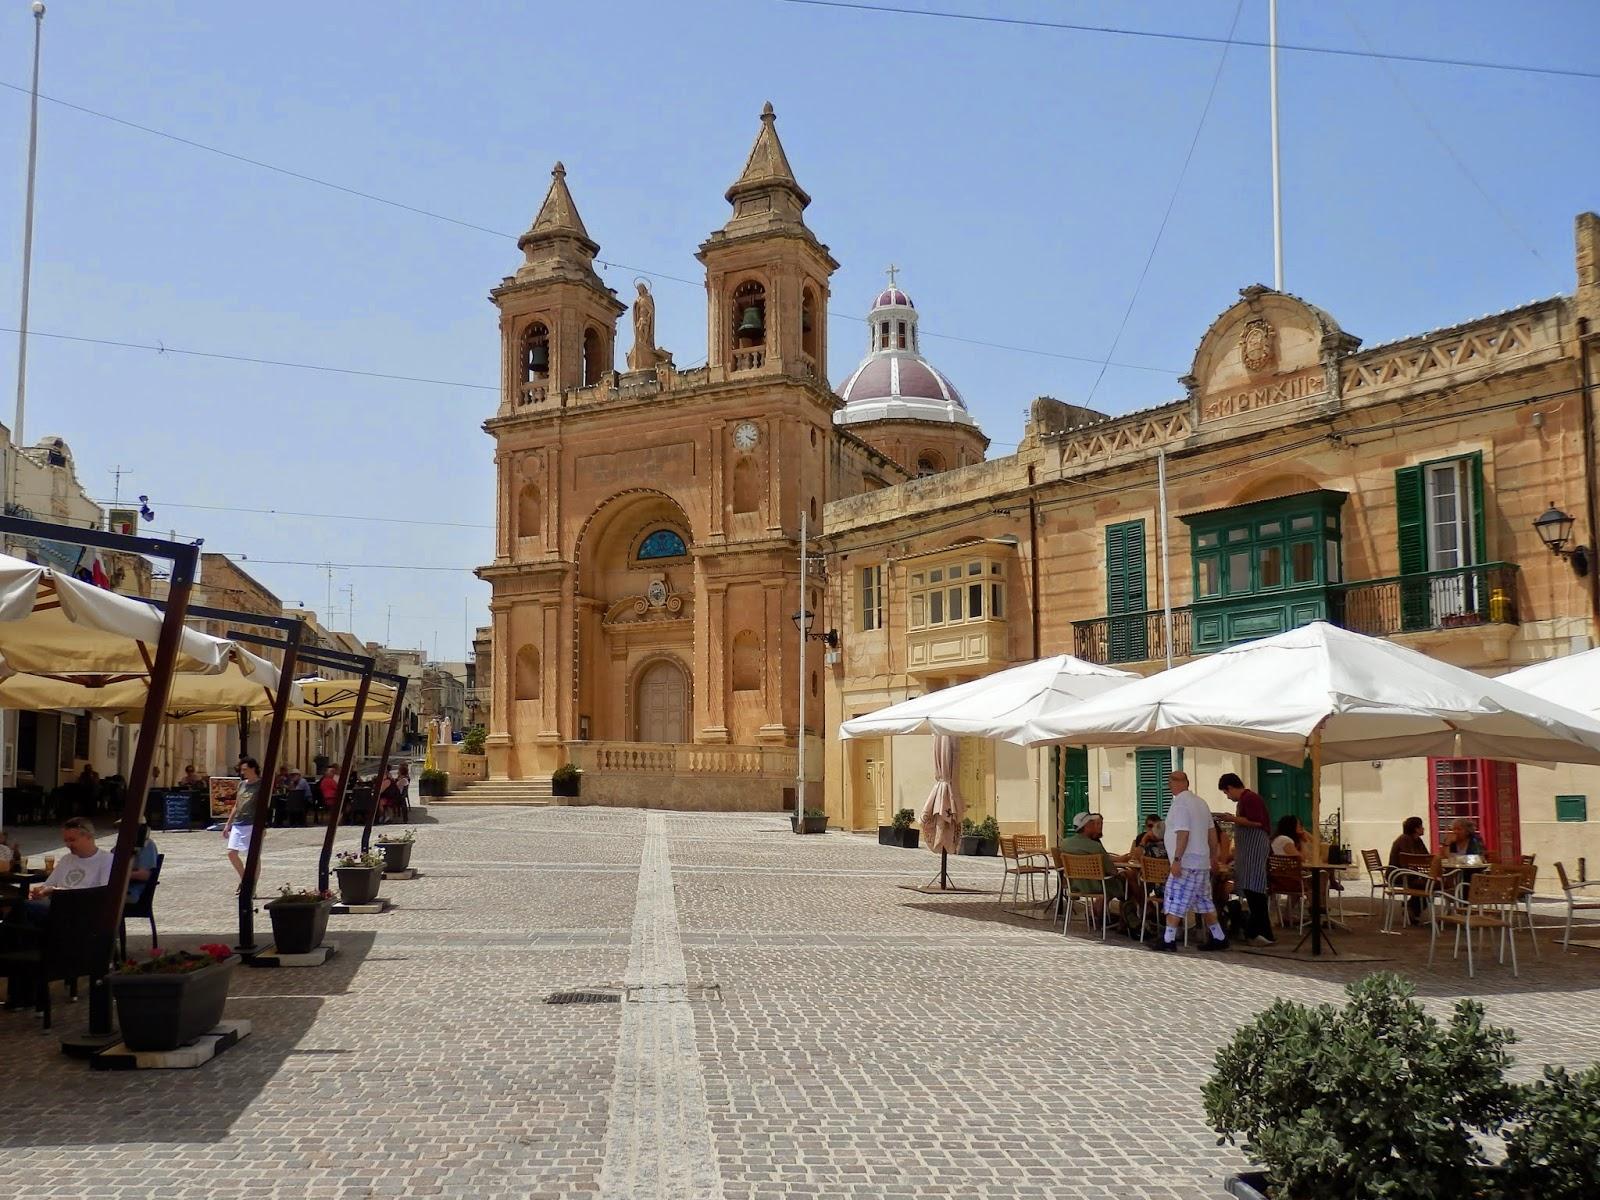 Church at Marsaxlokk, Malta